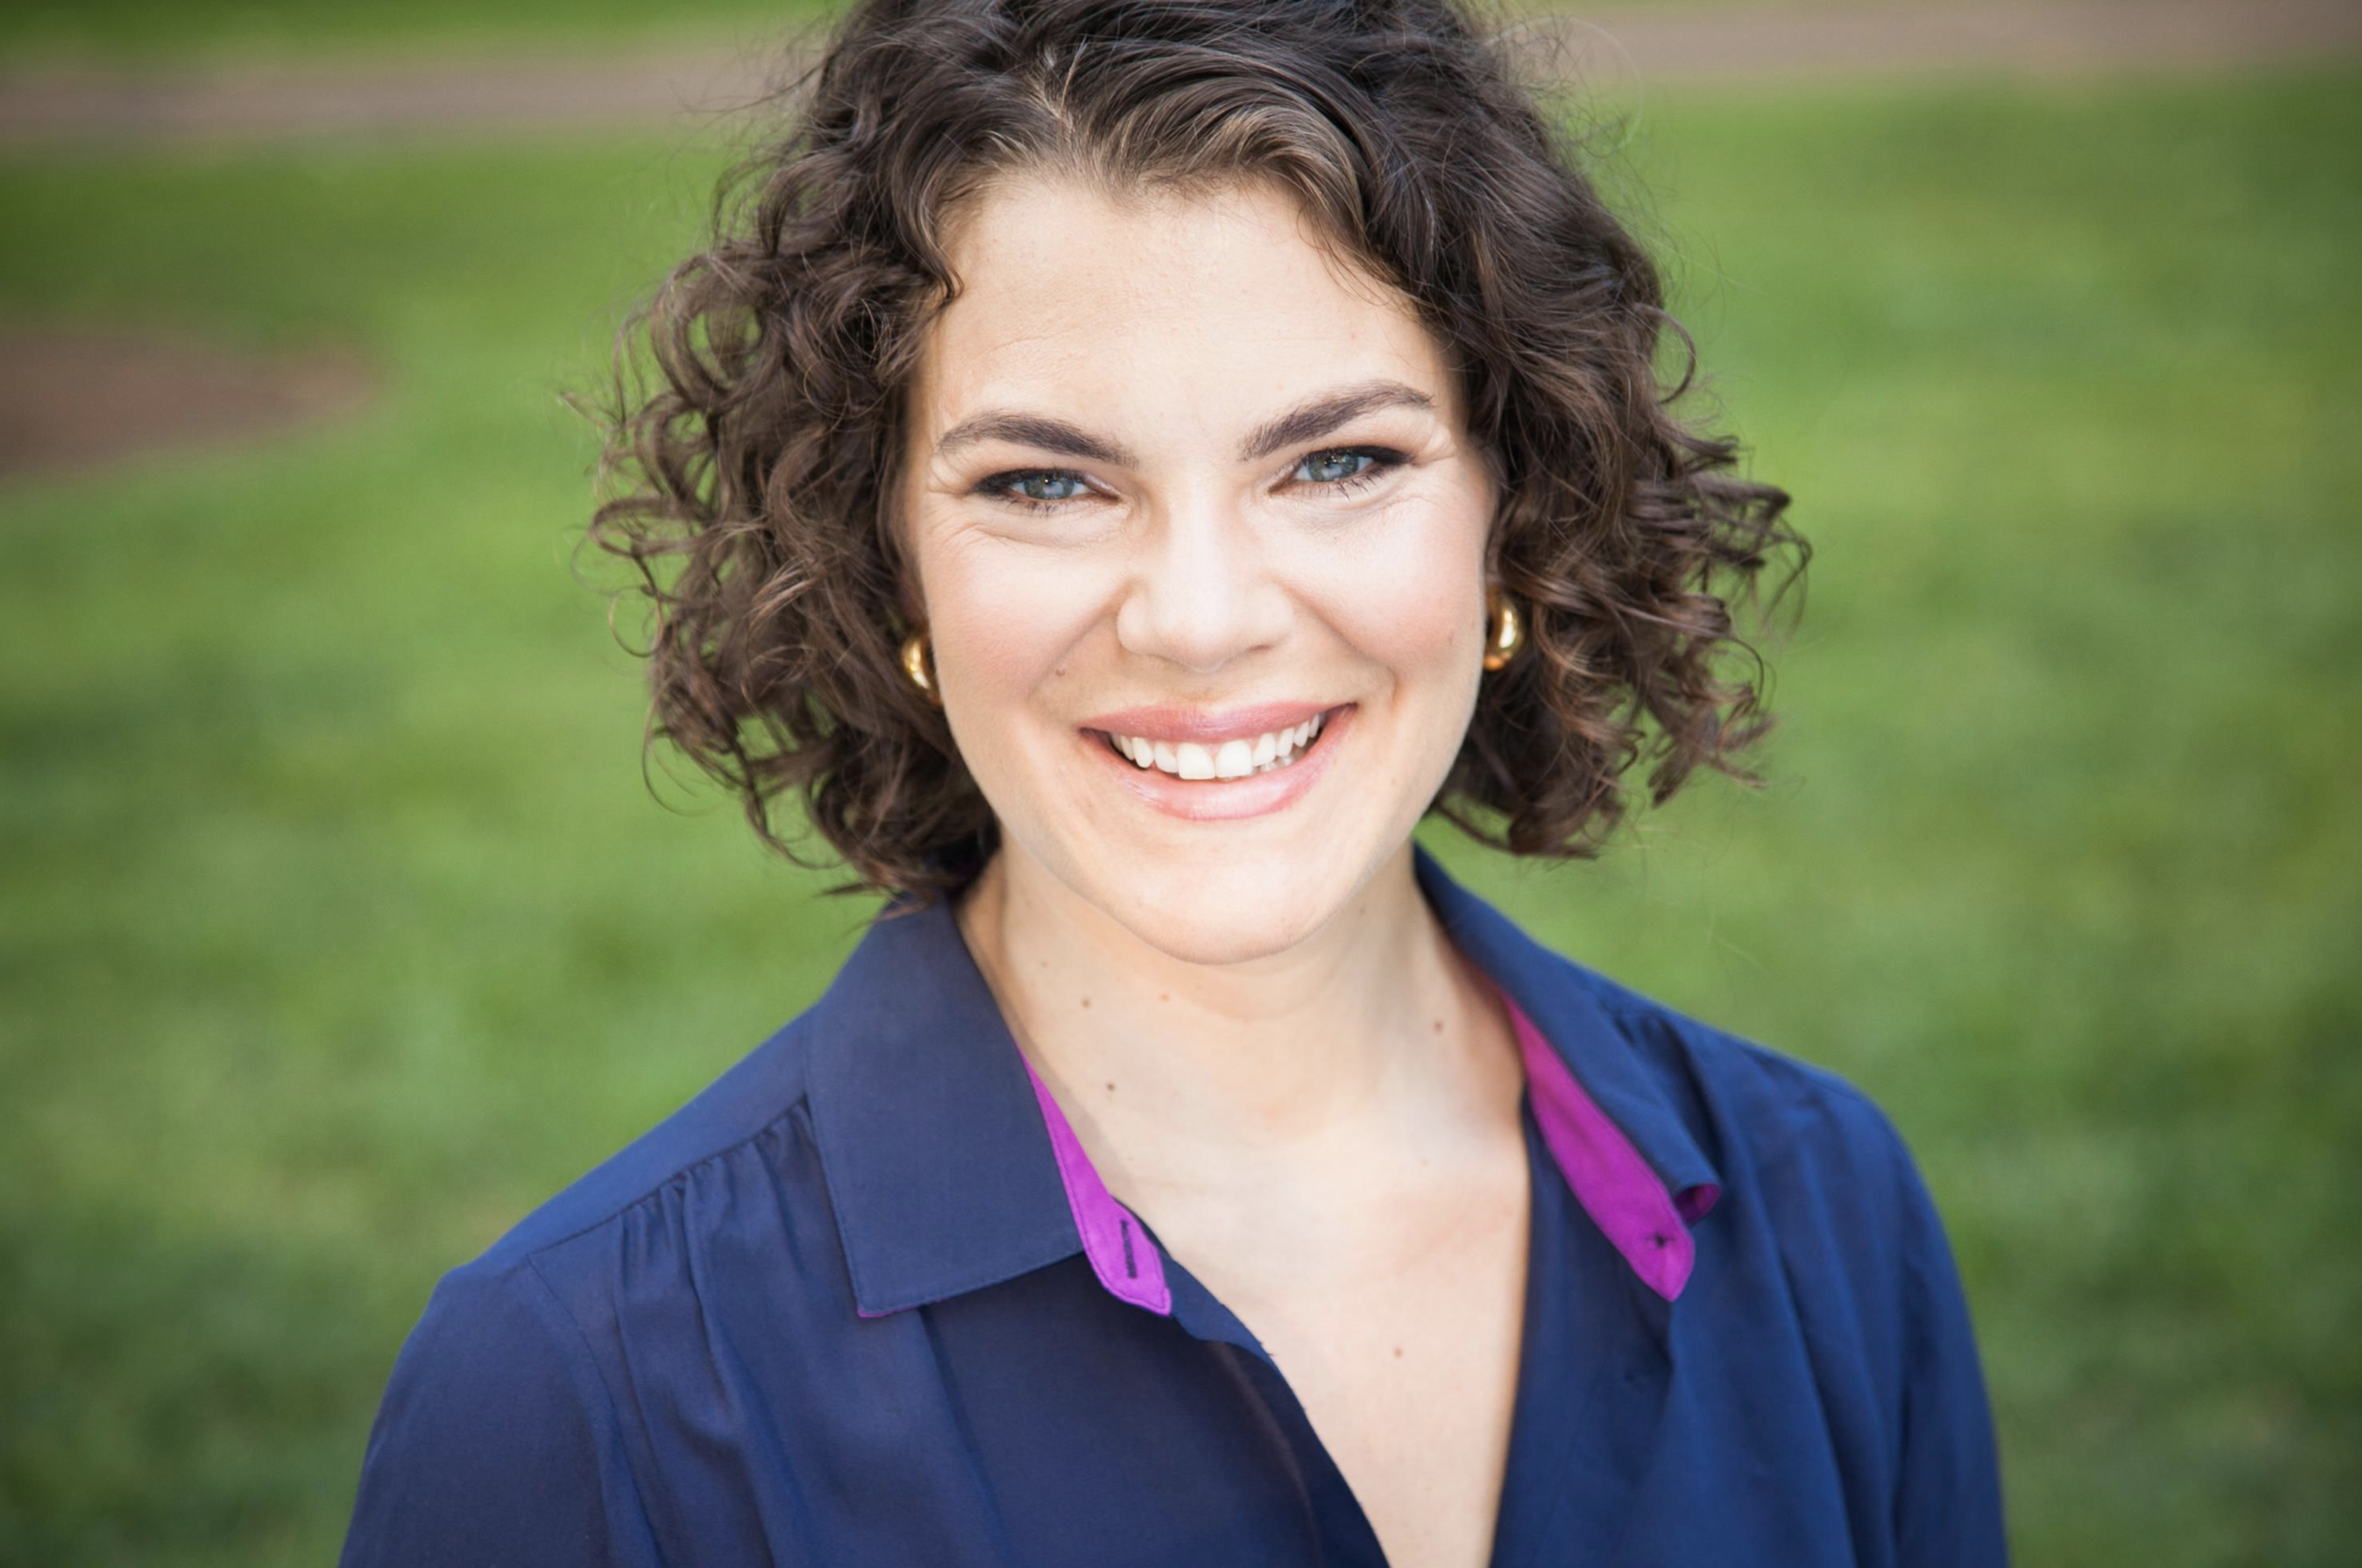 Renee vassilos - Founder, Banyan Innovation Group